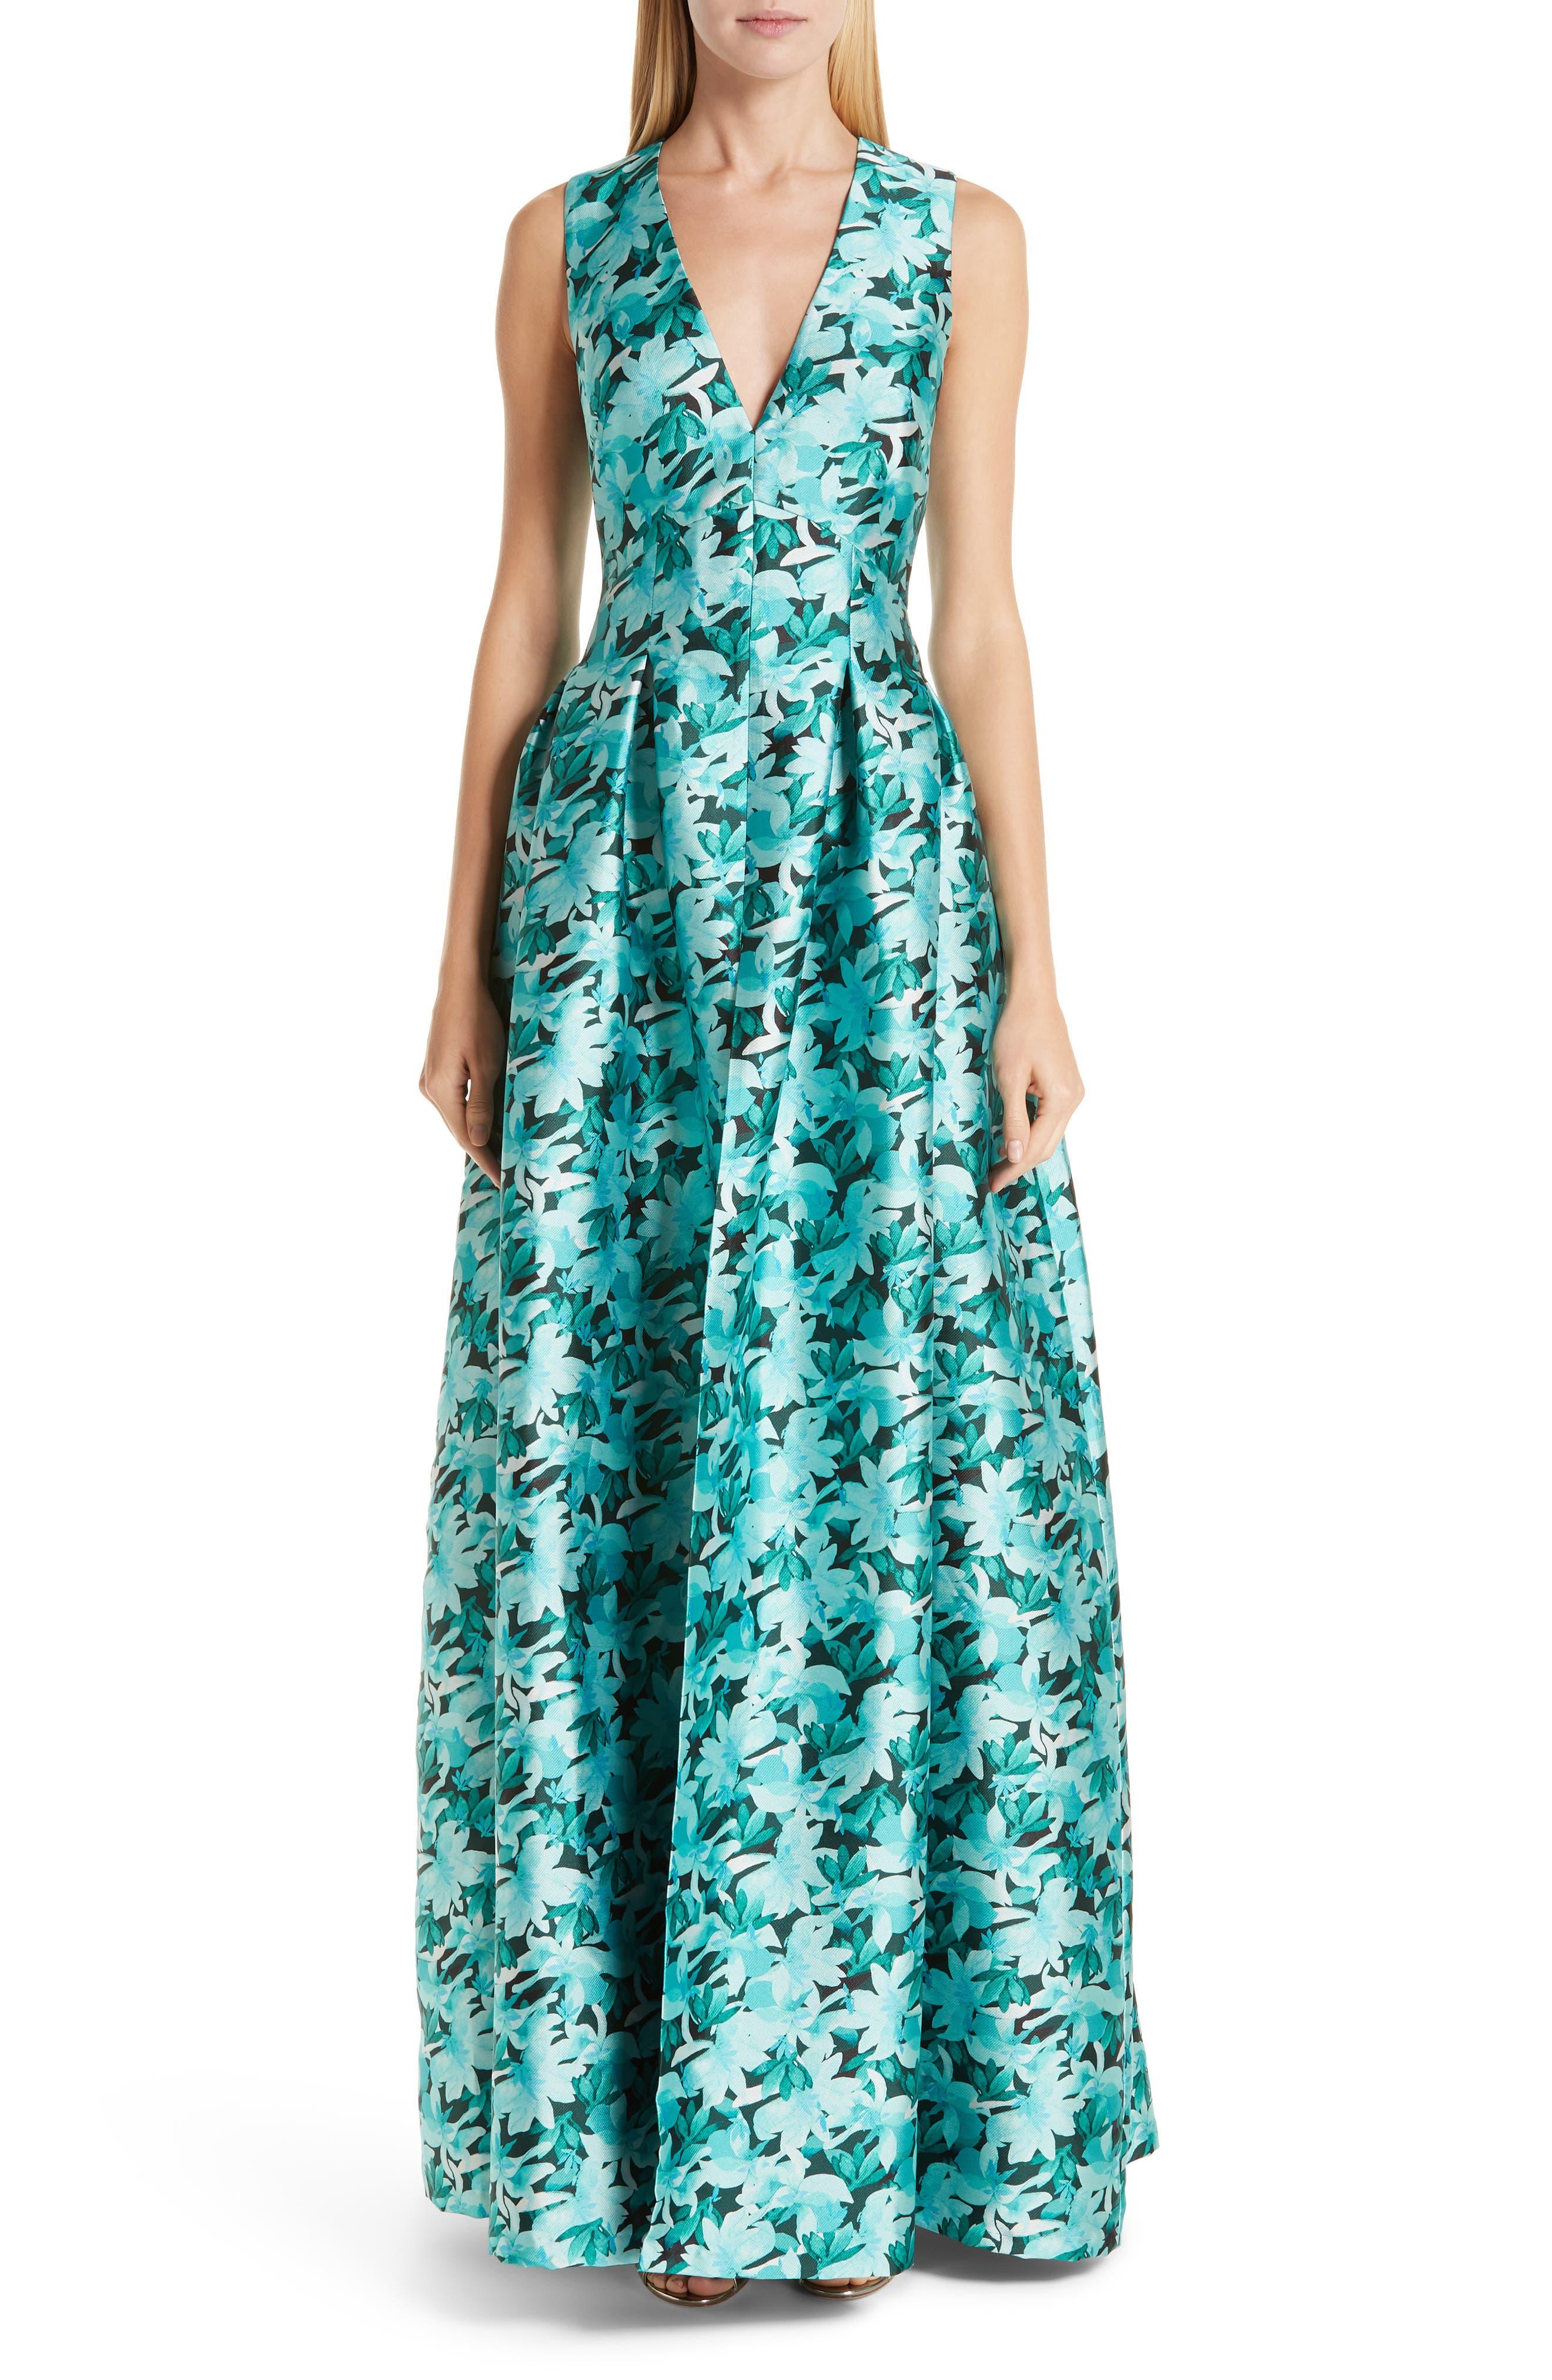 SACHIN & BABI Brooke Floral Print Gown, Main, color, TEAL